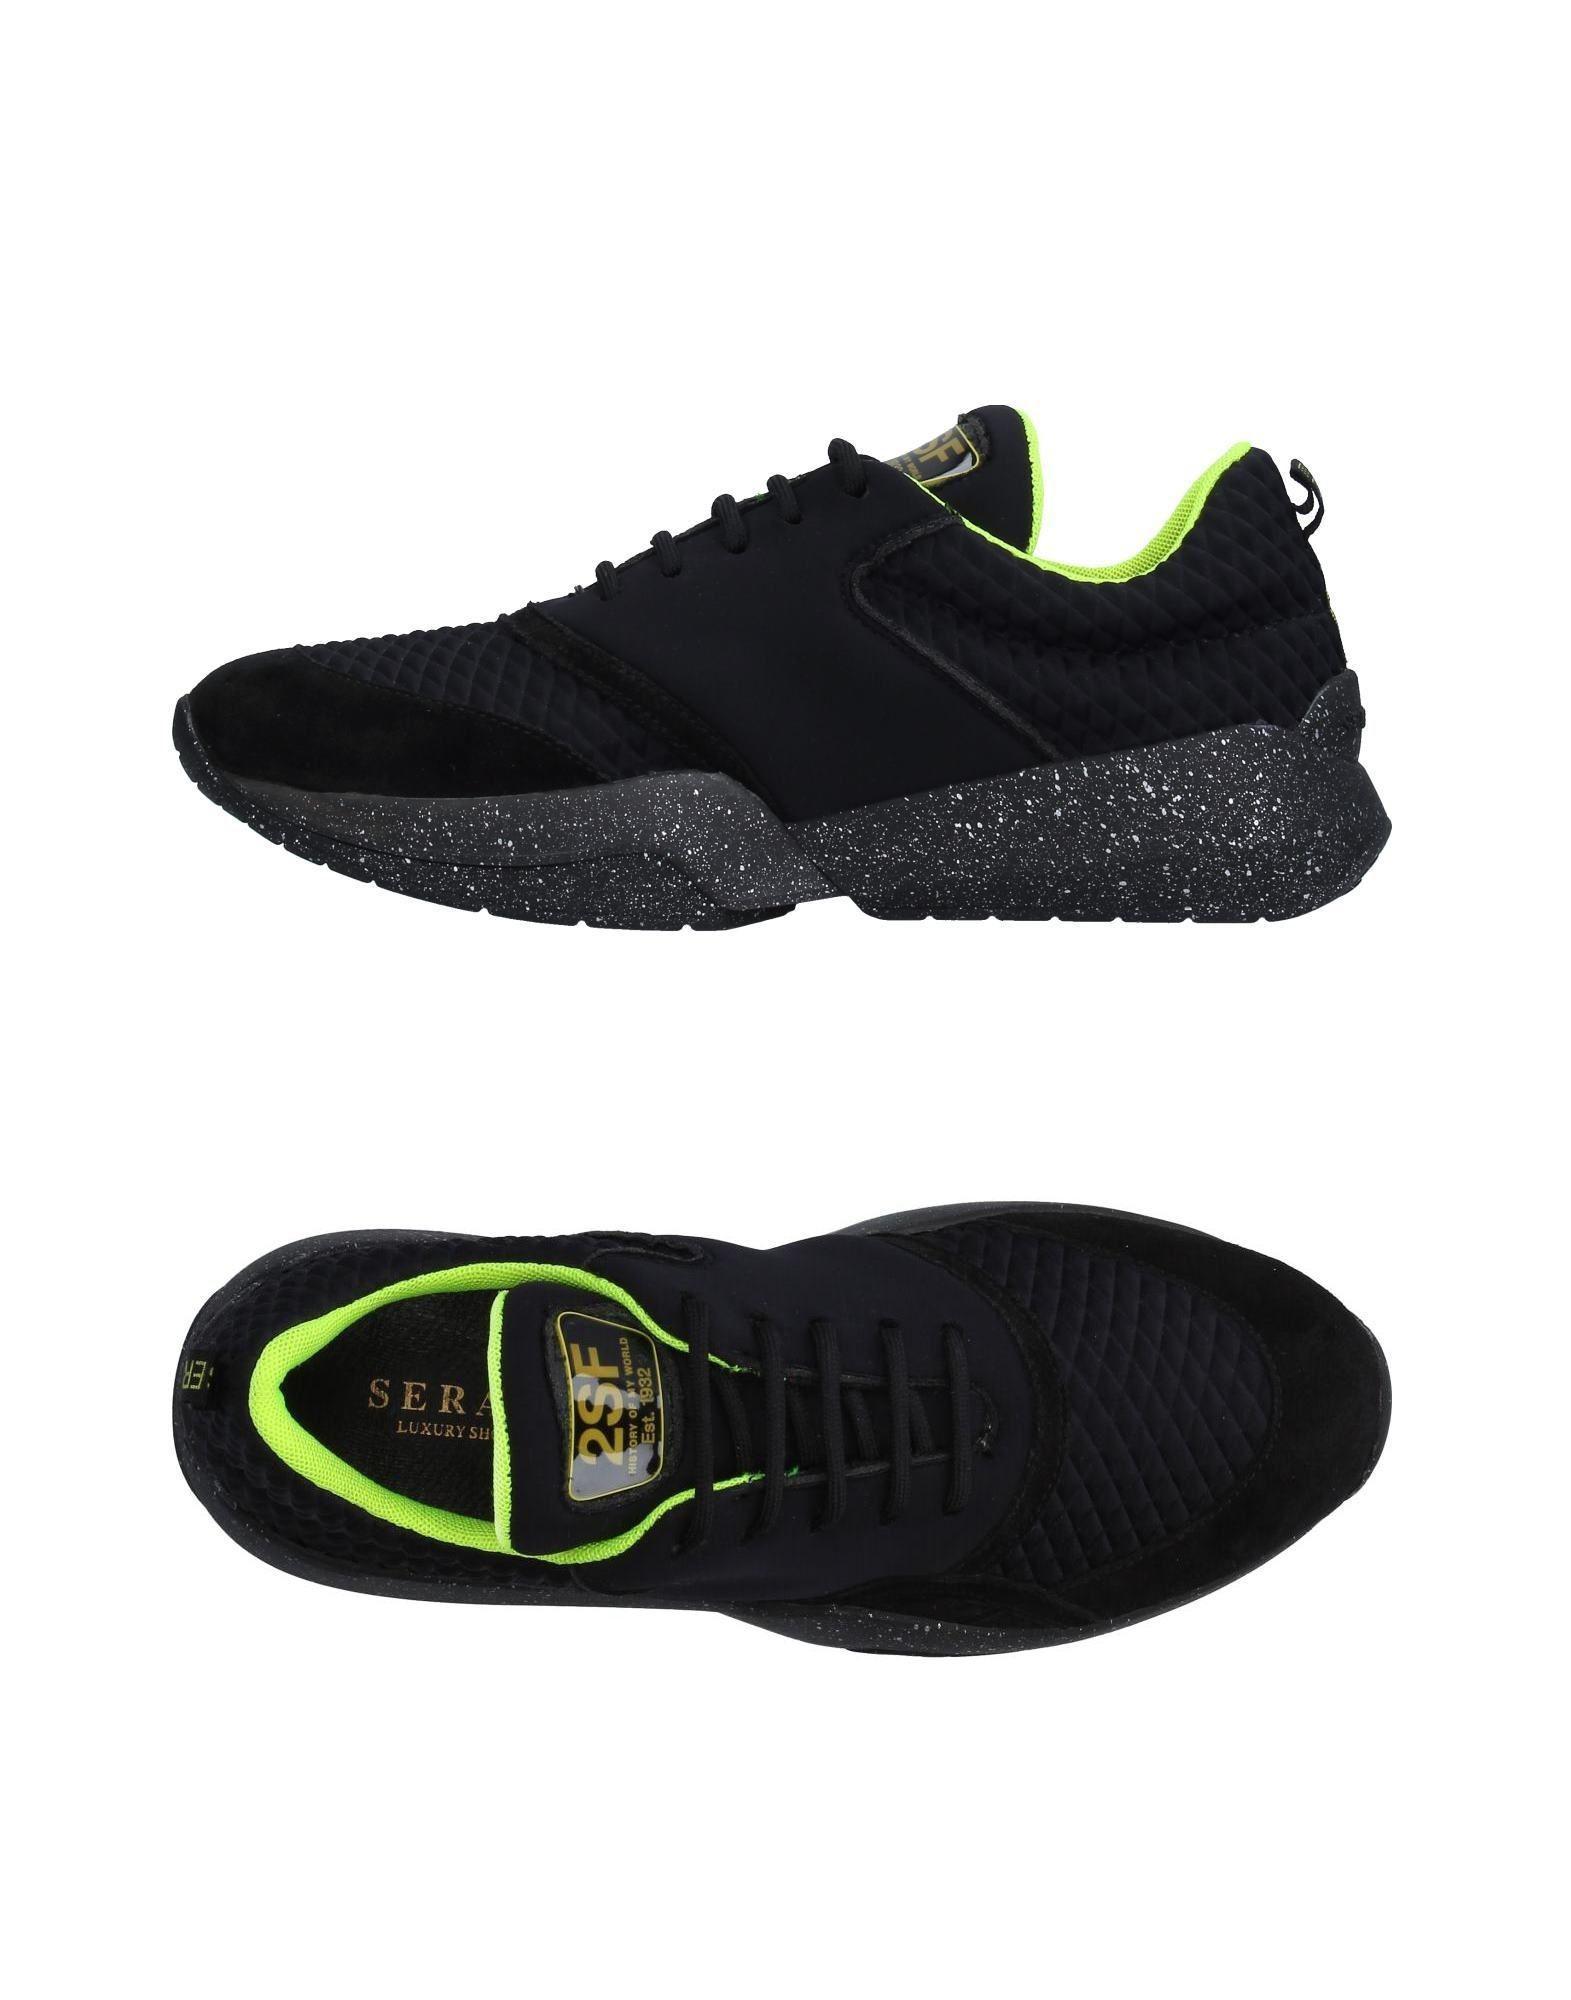 Serafini Luxe Bas-tops Et Chaussures De Sport IDWaU6